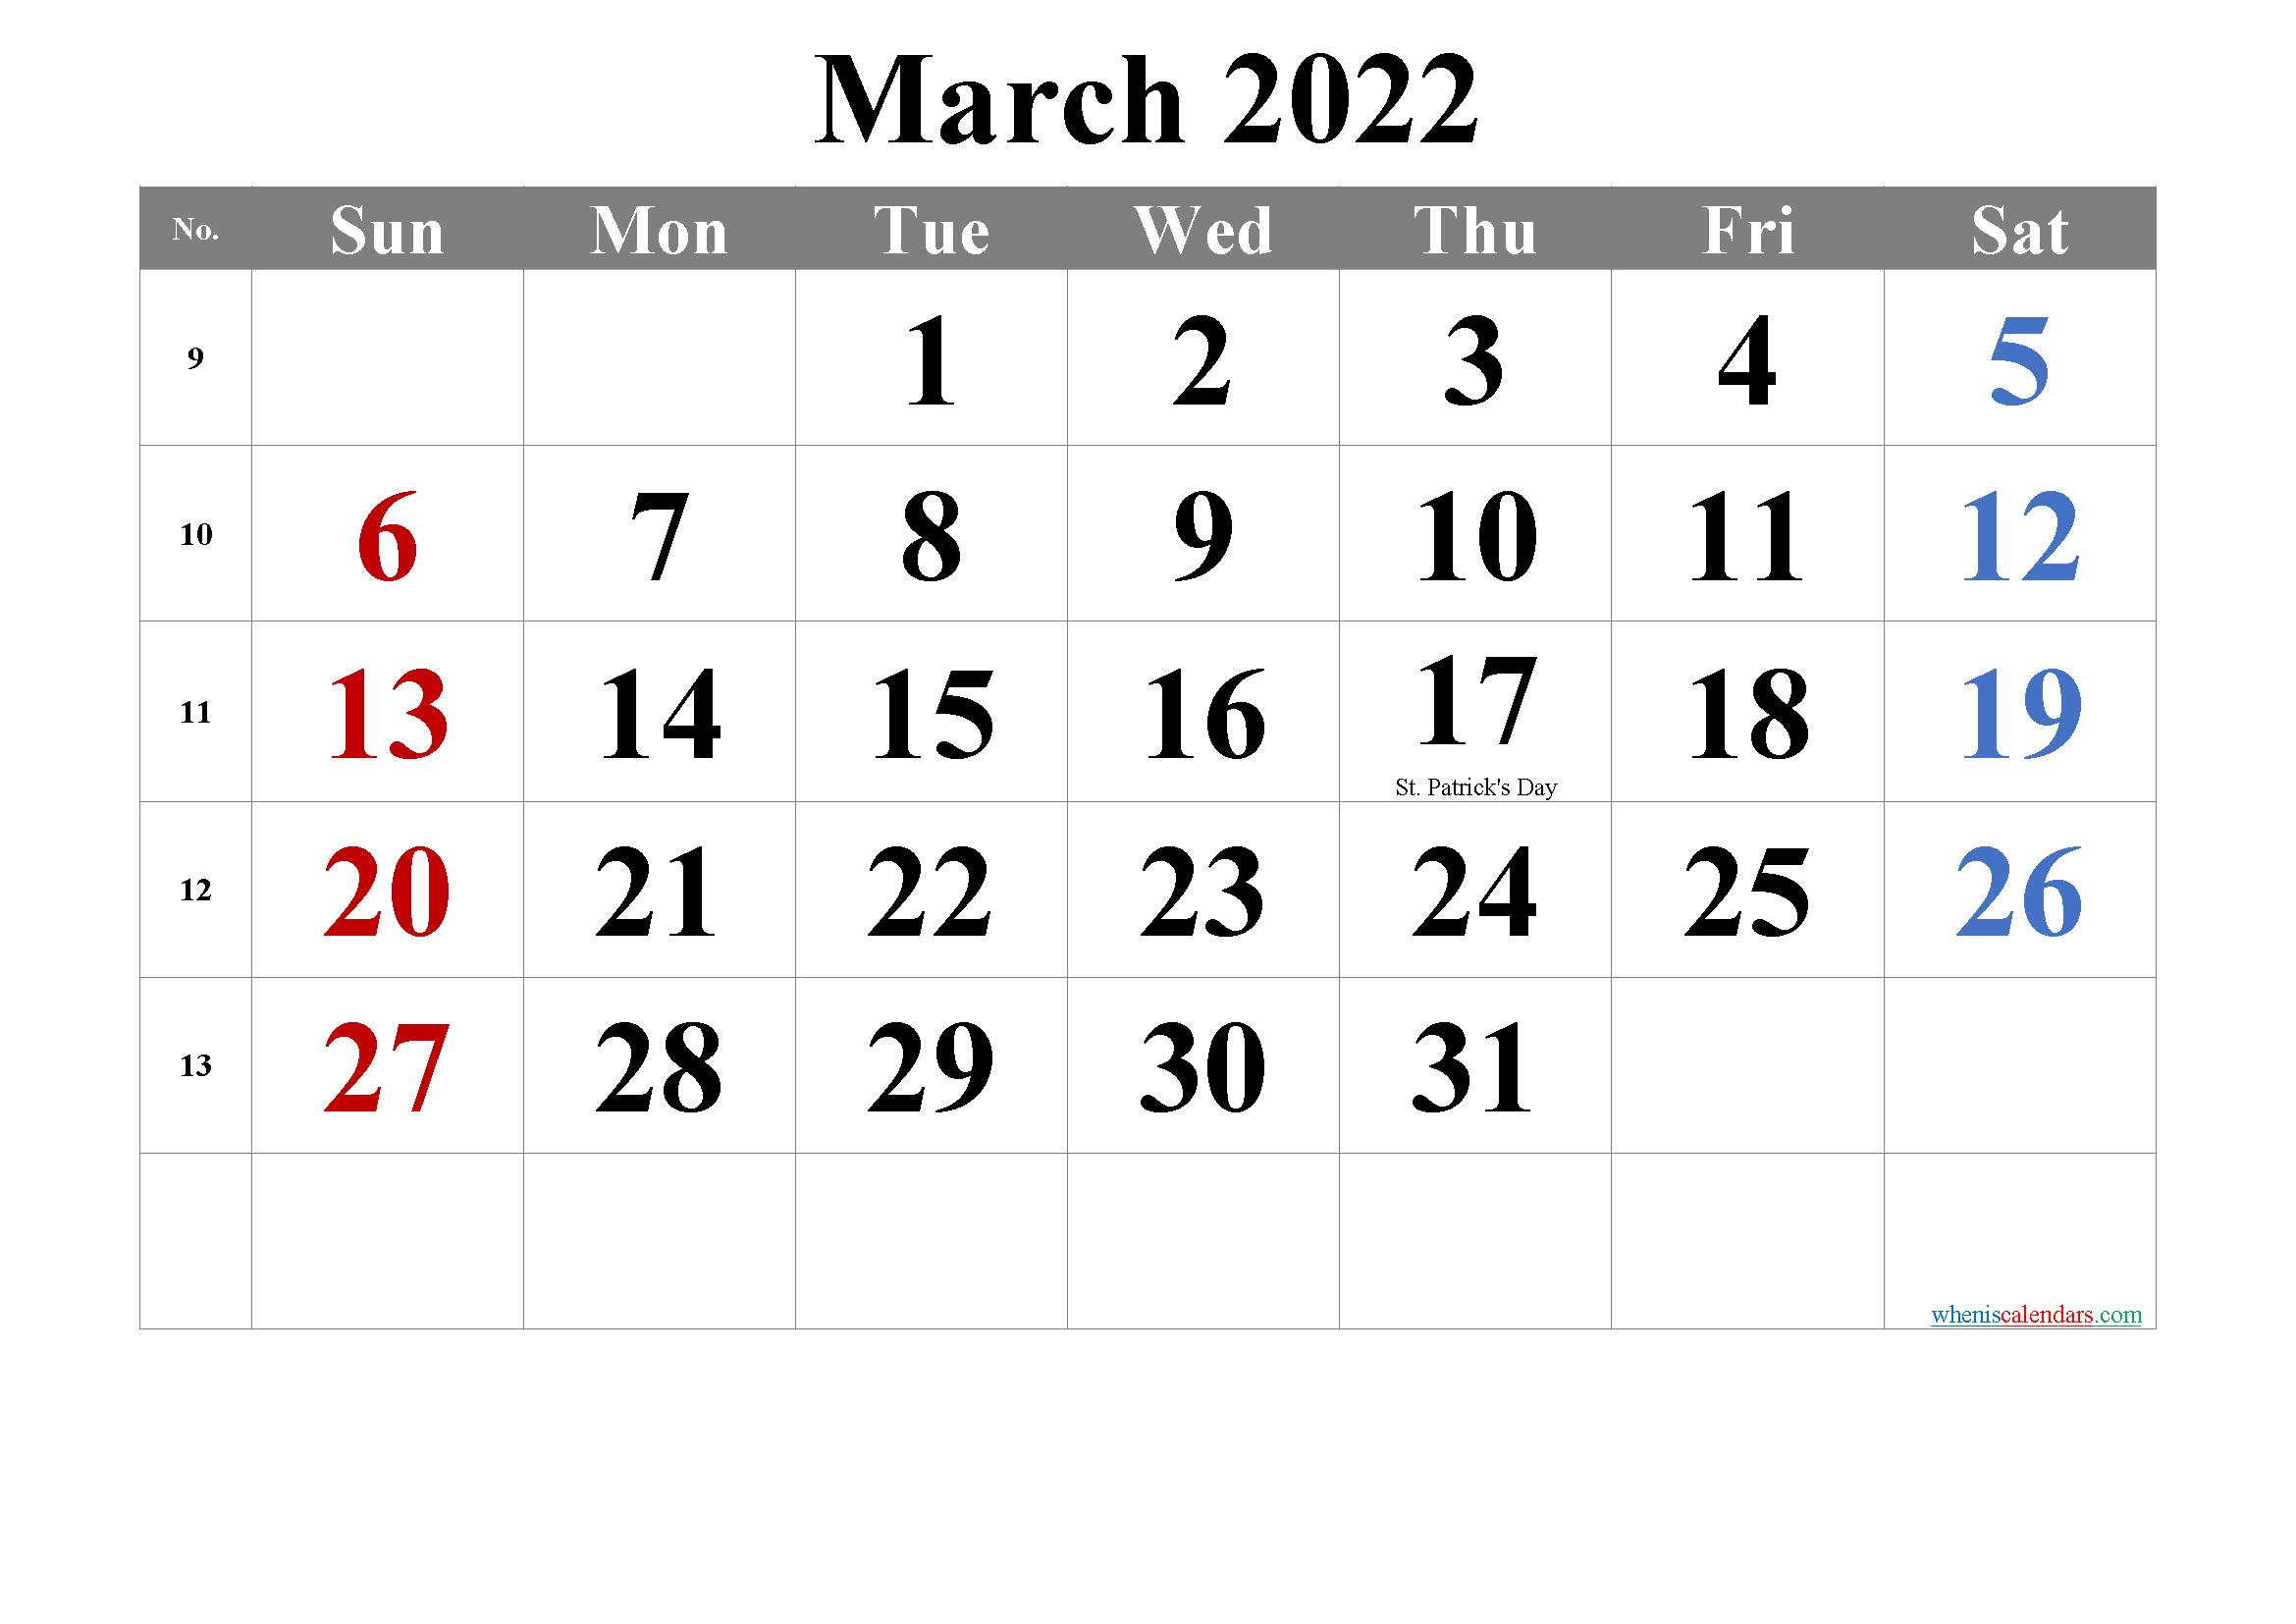 Free March 2022 Calendar Printable with Printable March 2022 Calendar